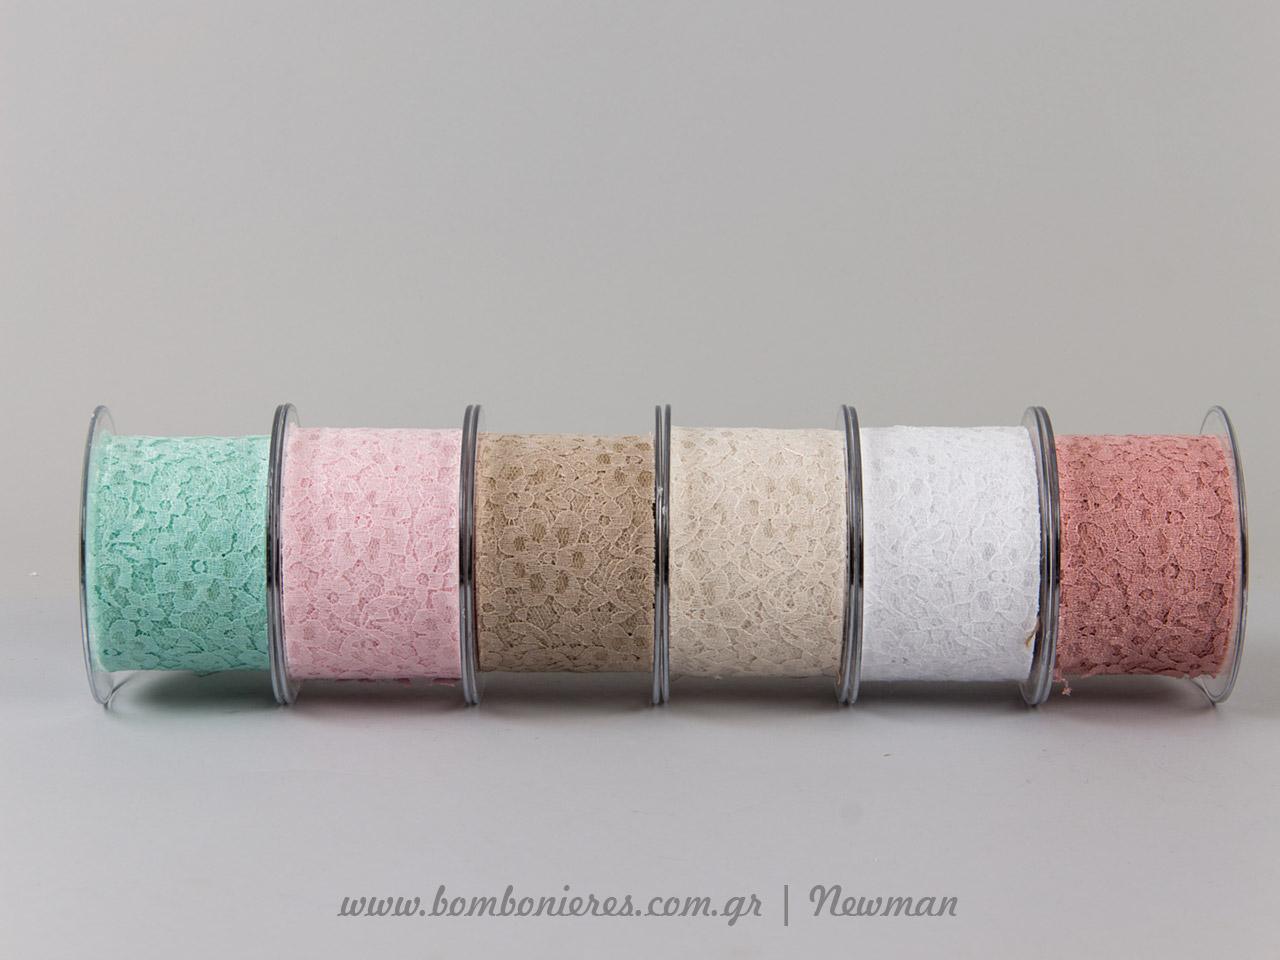 venezzia dantela 67mm 092065 δαντέλα 6 χρώματα